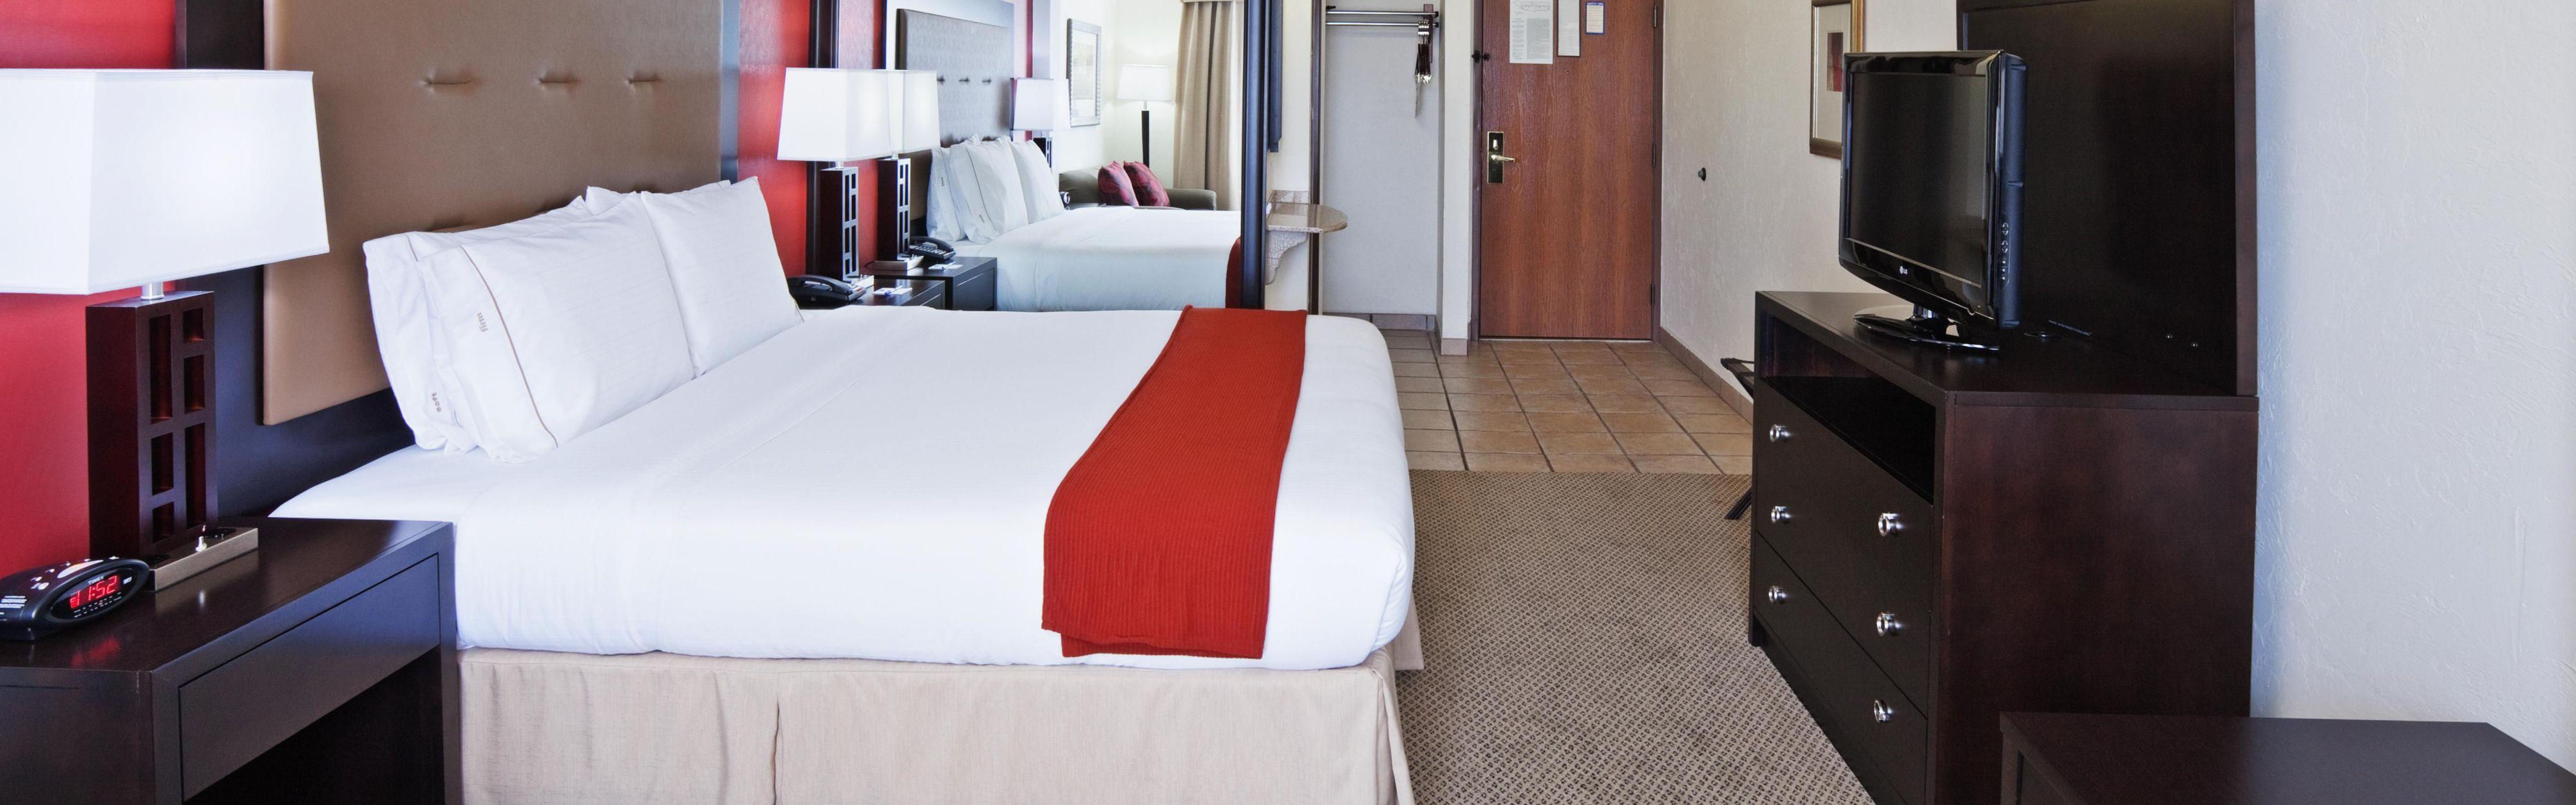 Holiday Inn Express & Suites Oklahoma City-Penn Square image 1